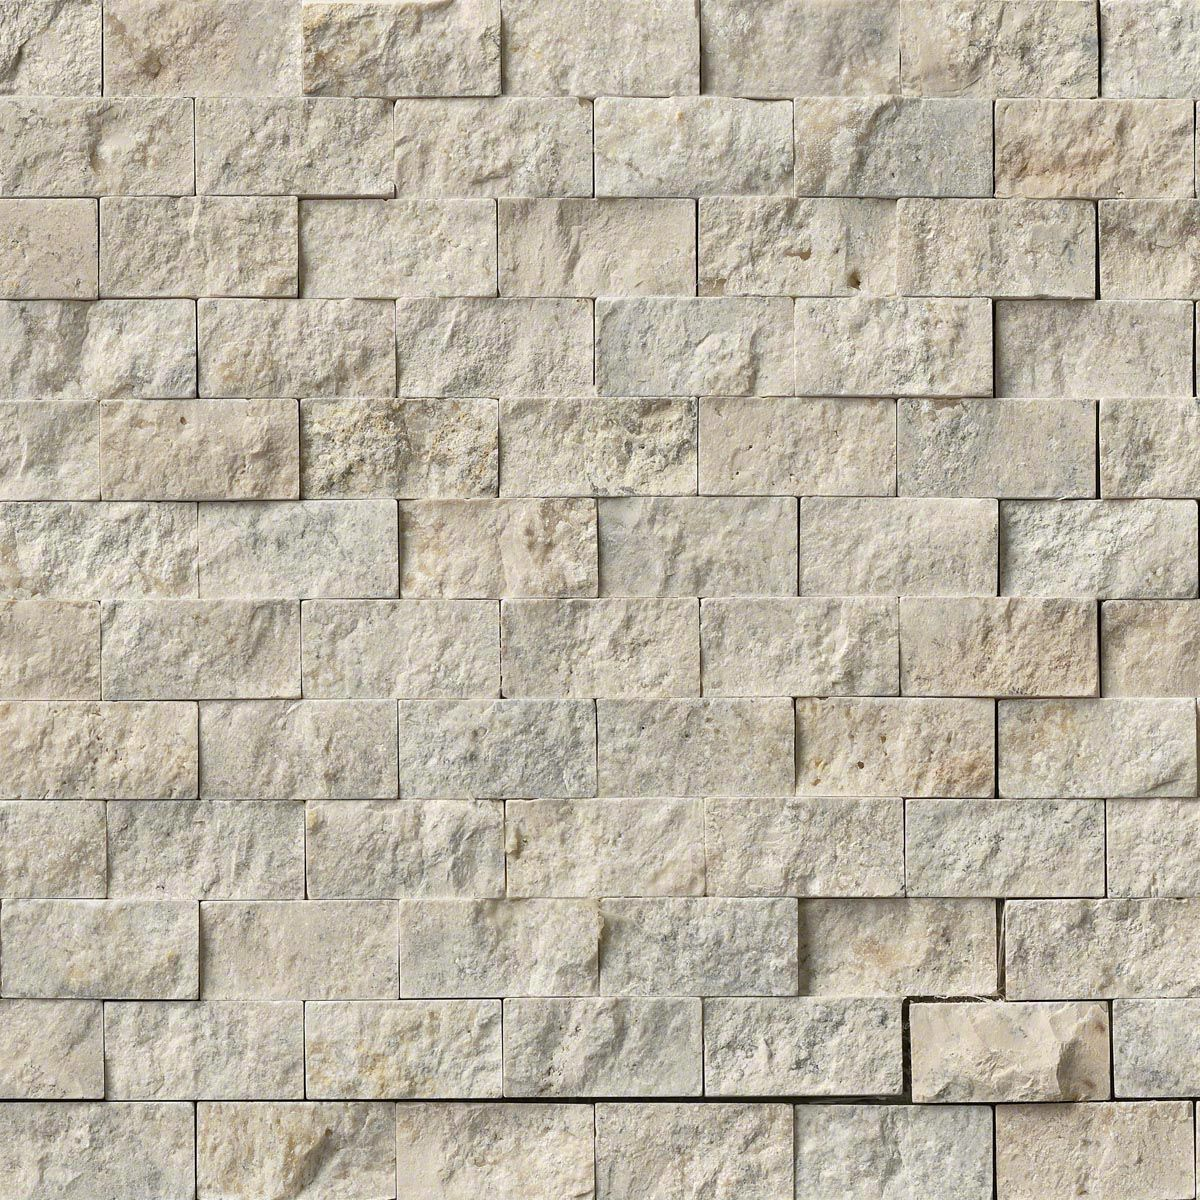 Puebla 1x2 Splitface In 12x12 Mesh Backsplash Stone Tub Wall Tiles